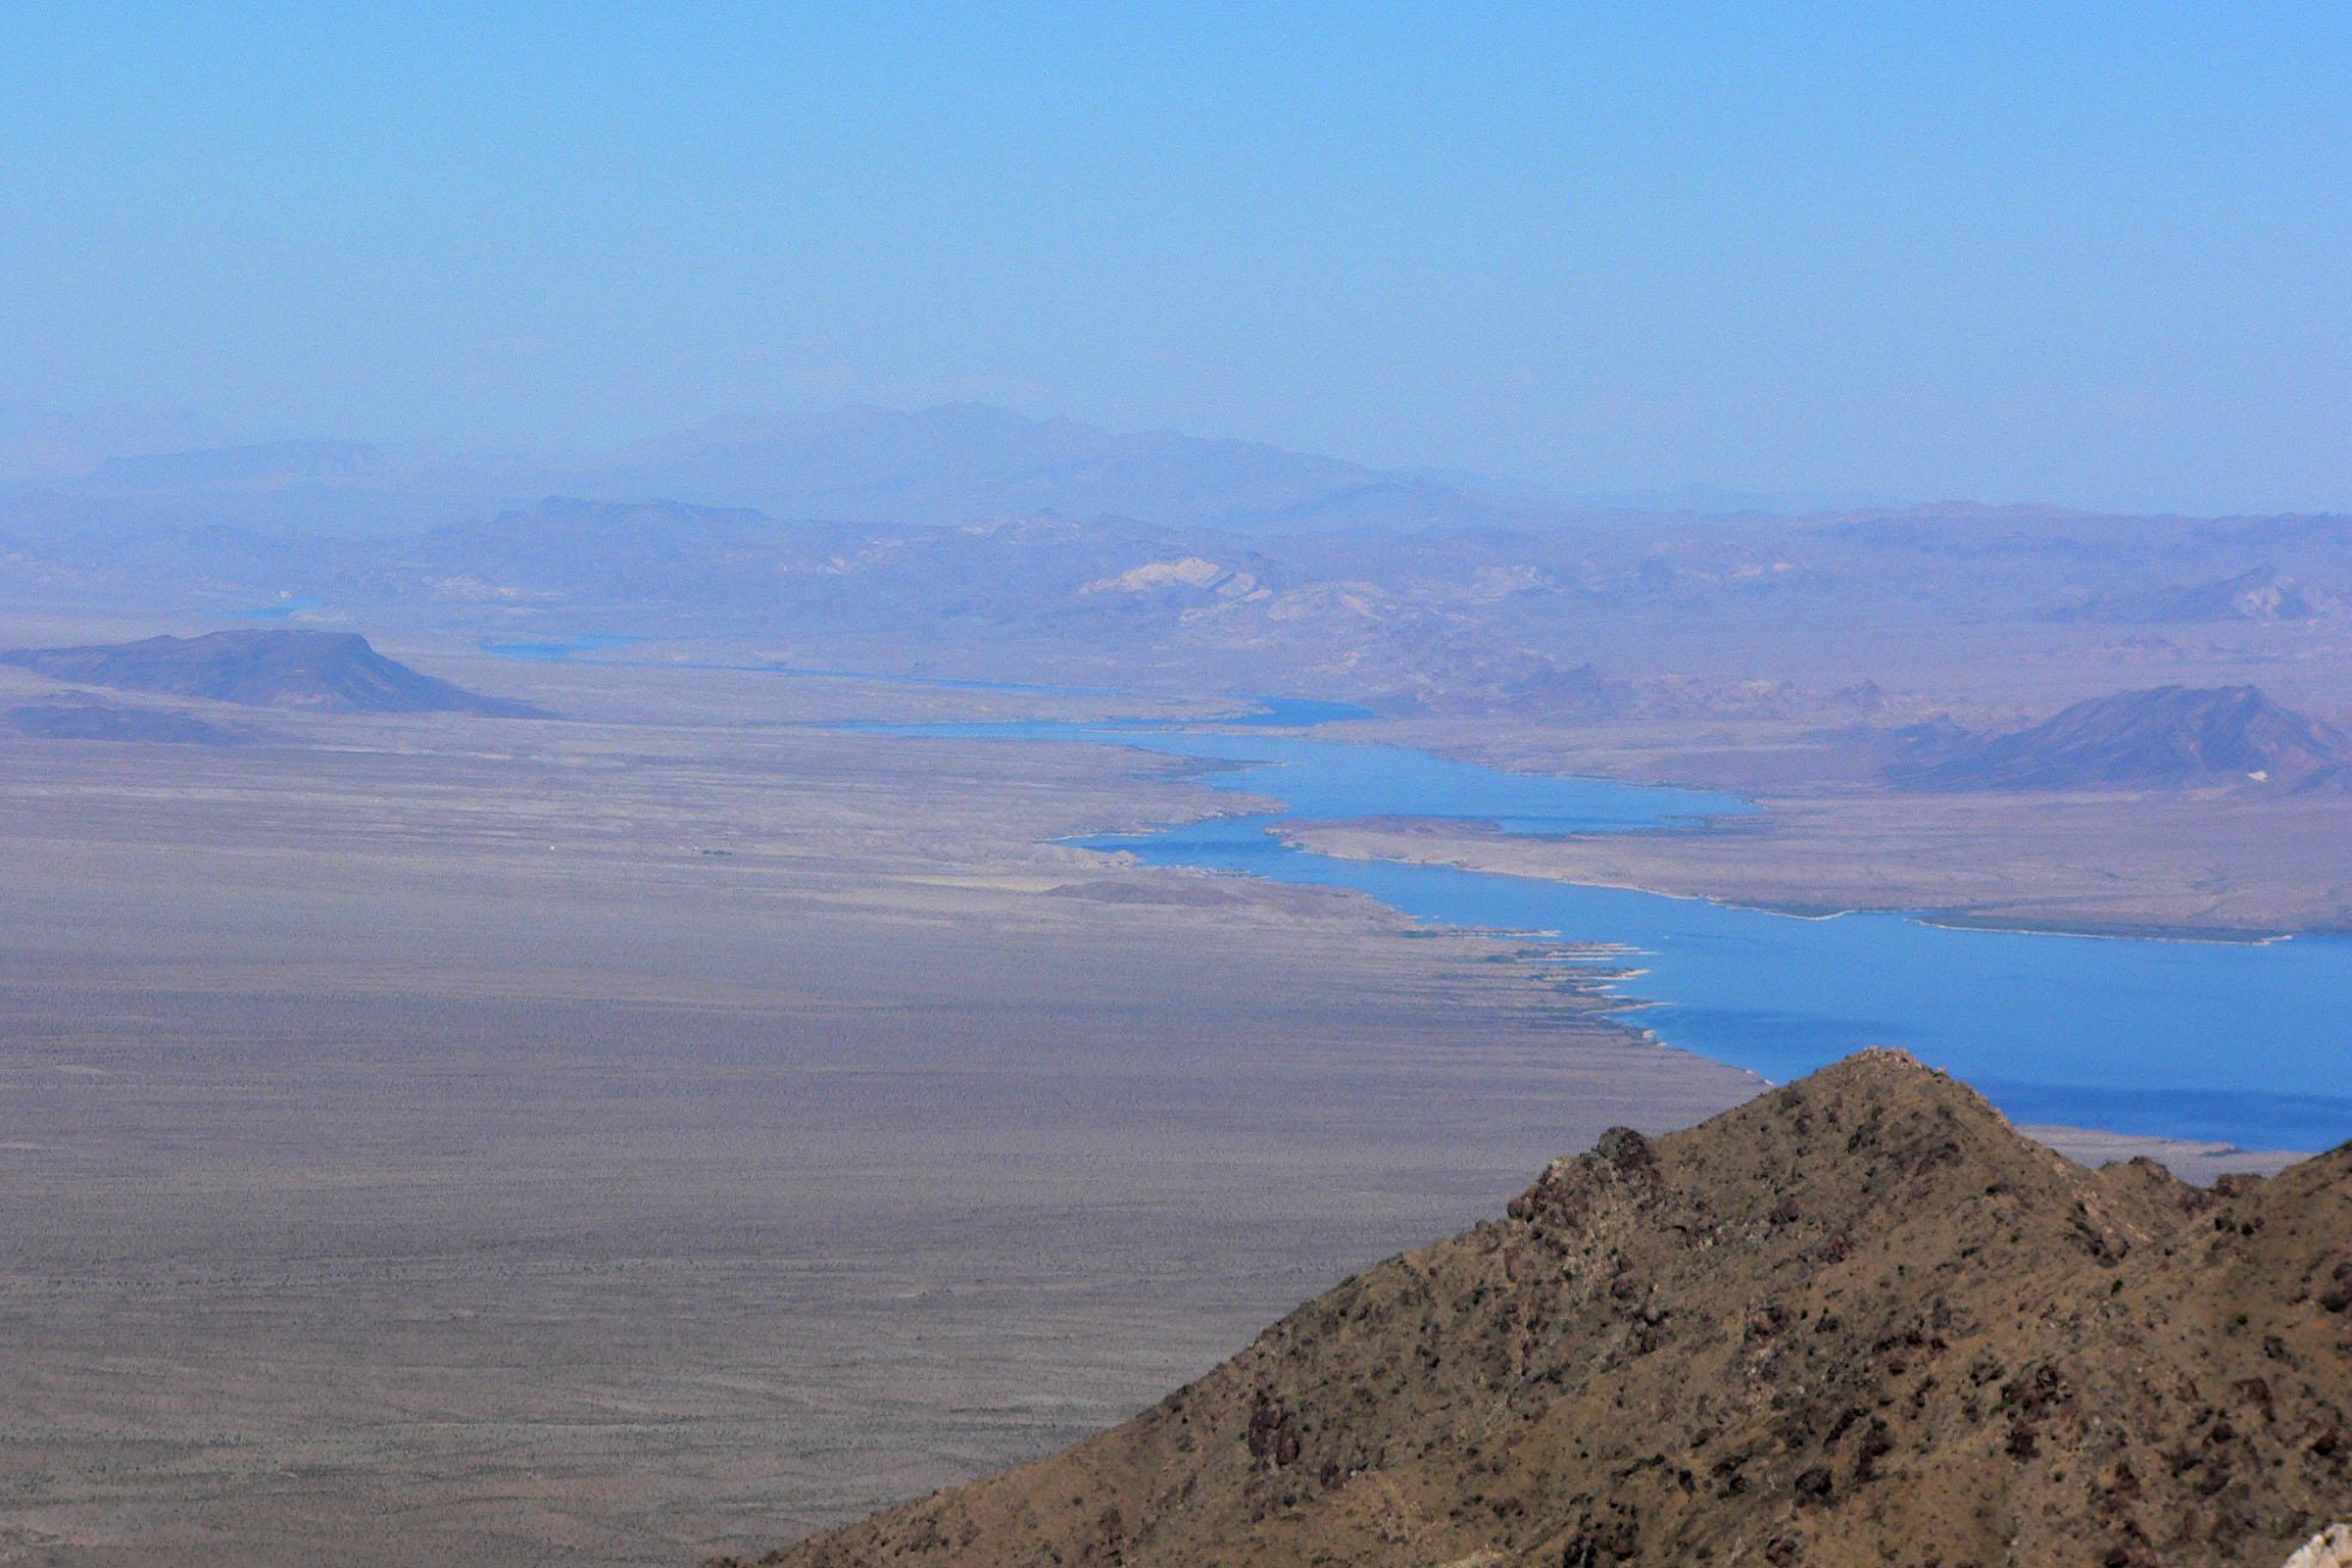 File:Lake Mohave from Spirit Mountain 2.jpg